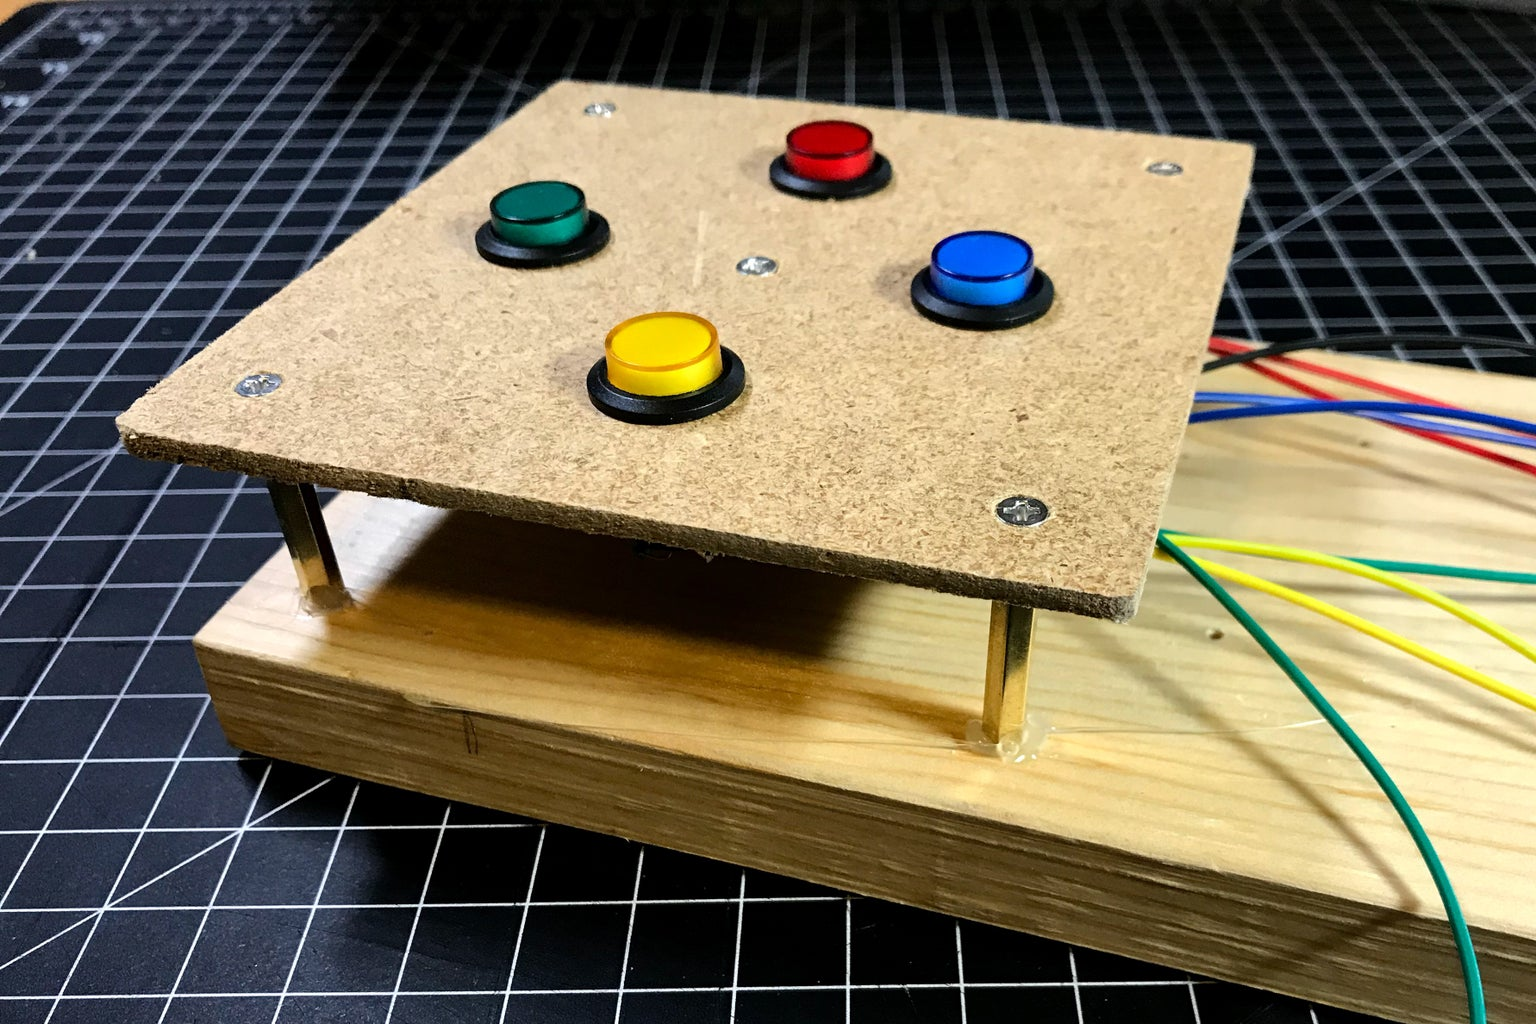 Attach Button Switch Unit to the Main Board